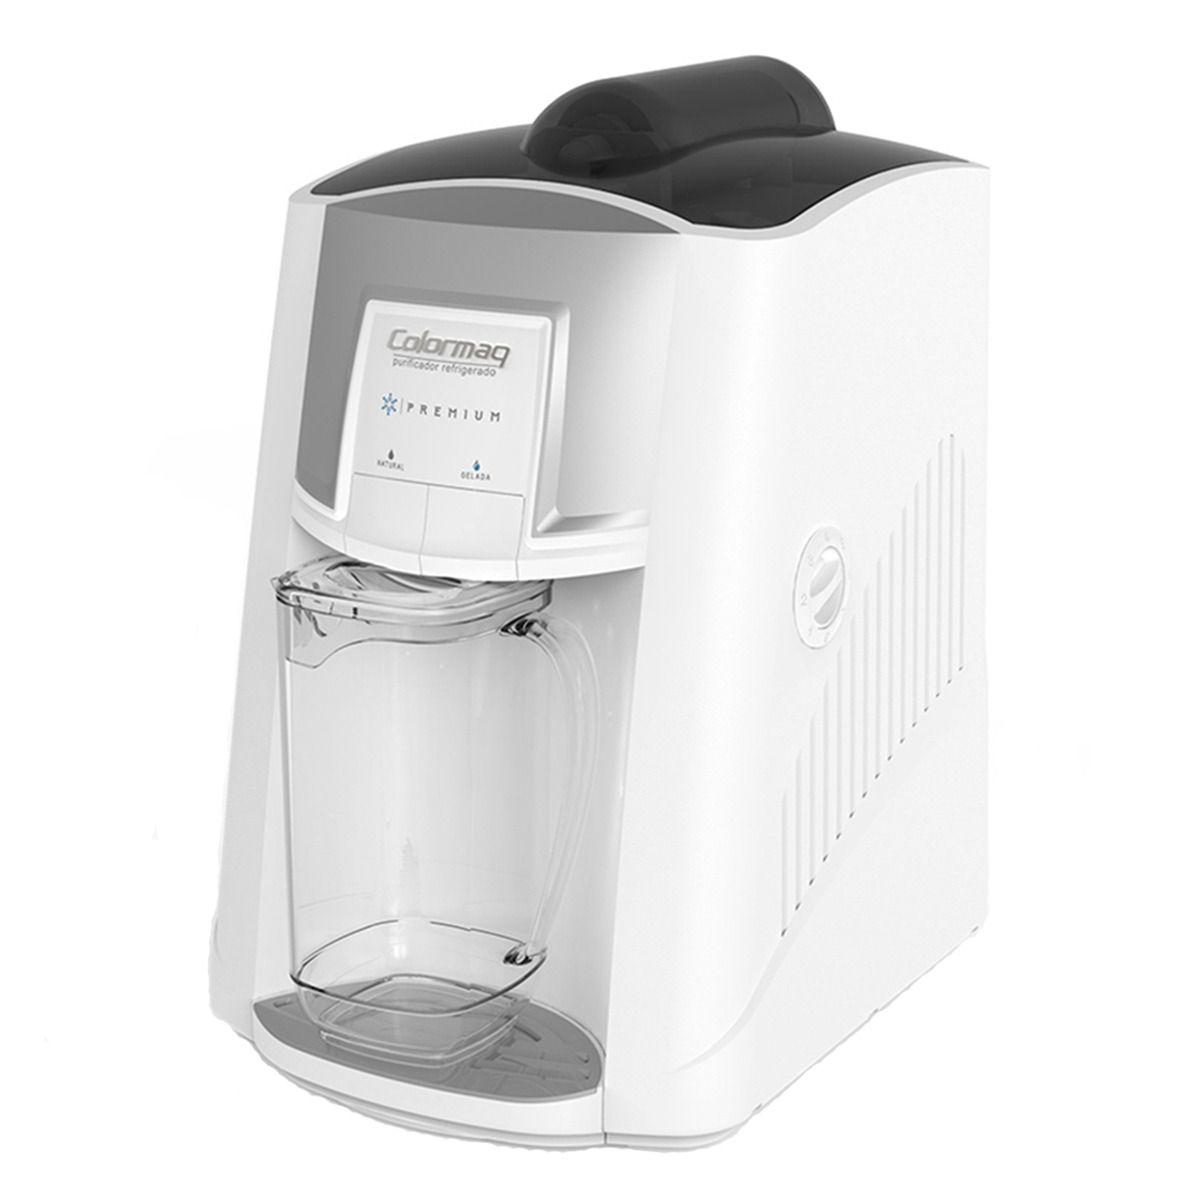 Purificador De Água Colormaq Premium Branco - 127V